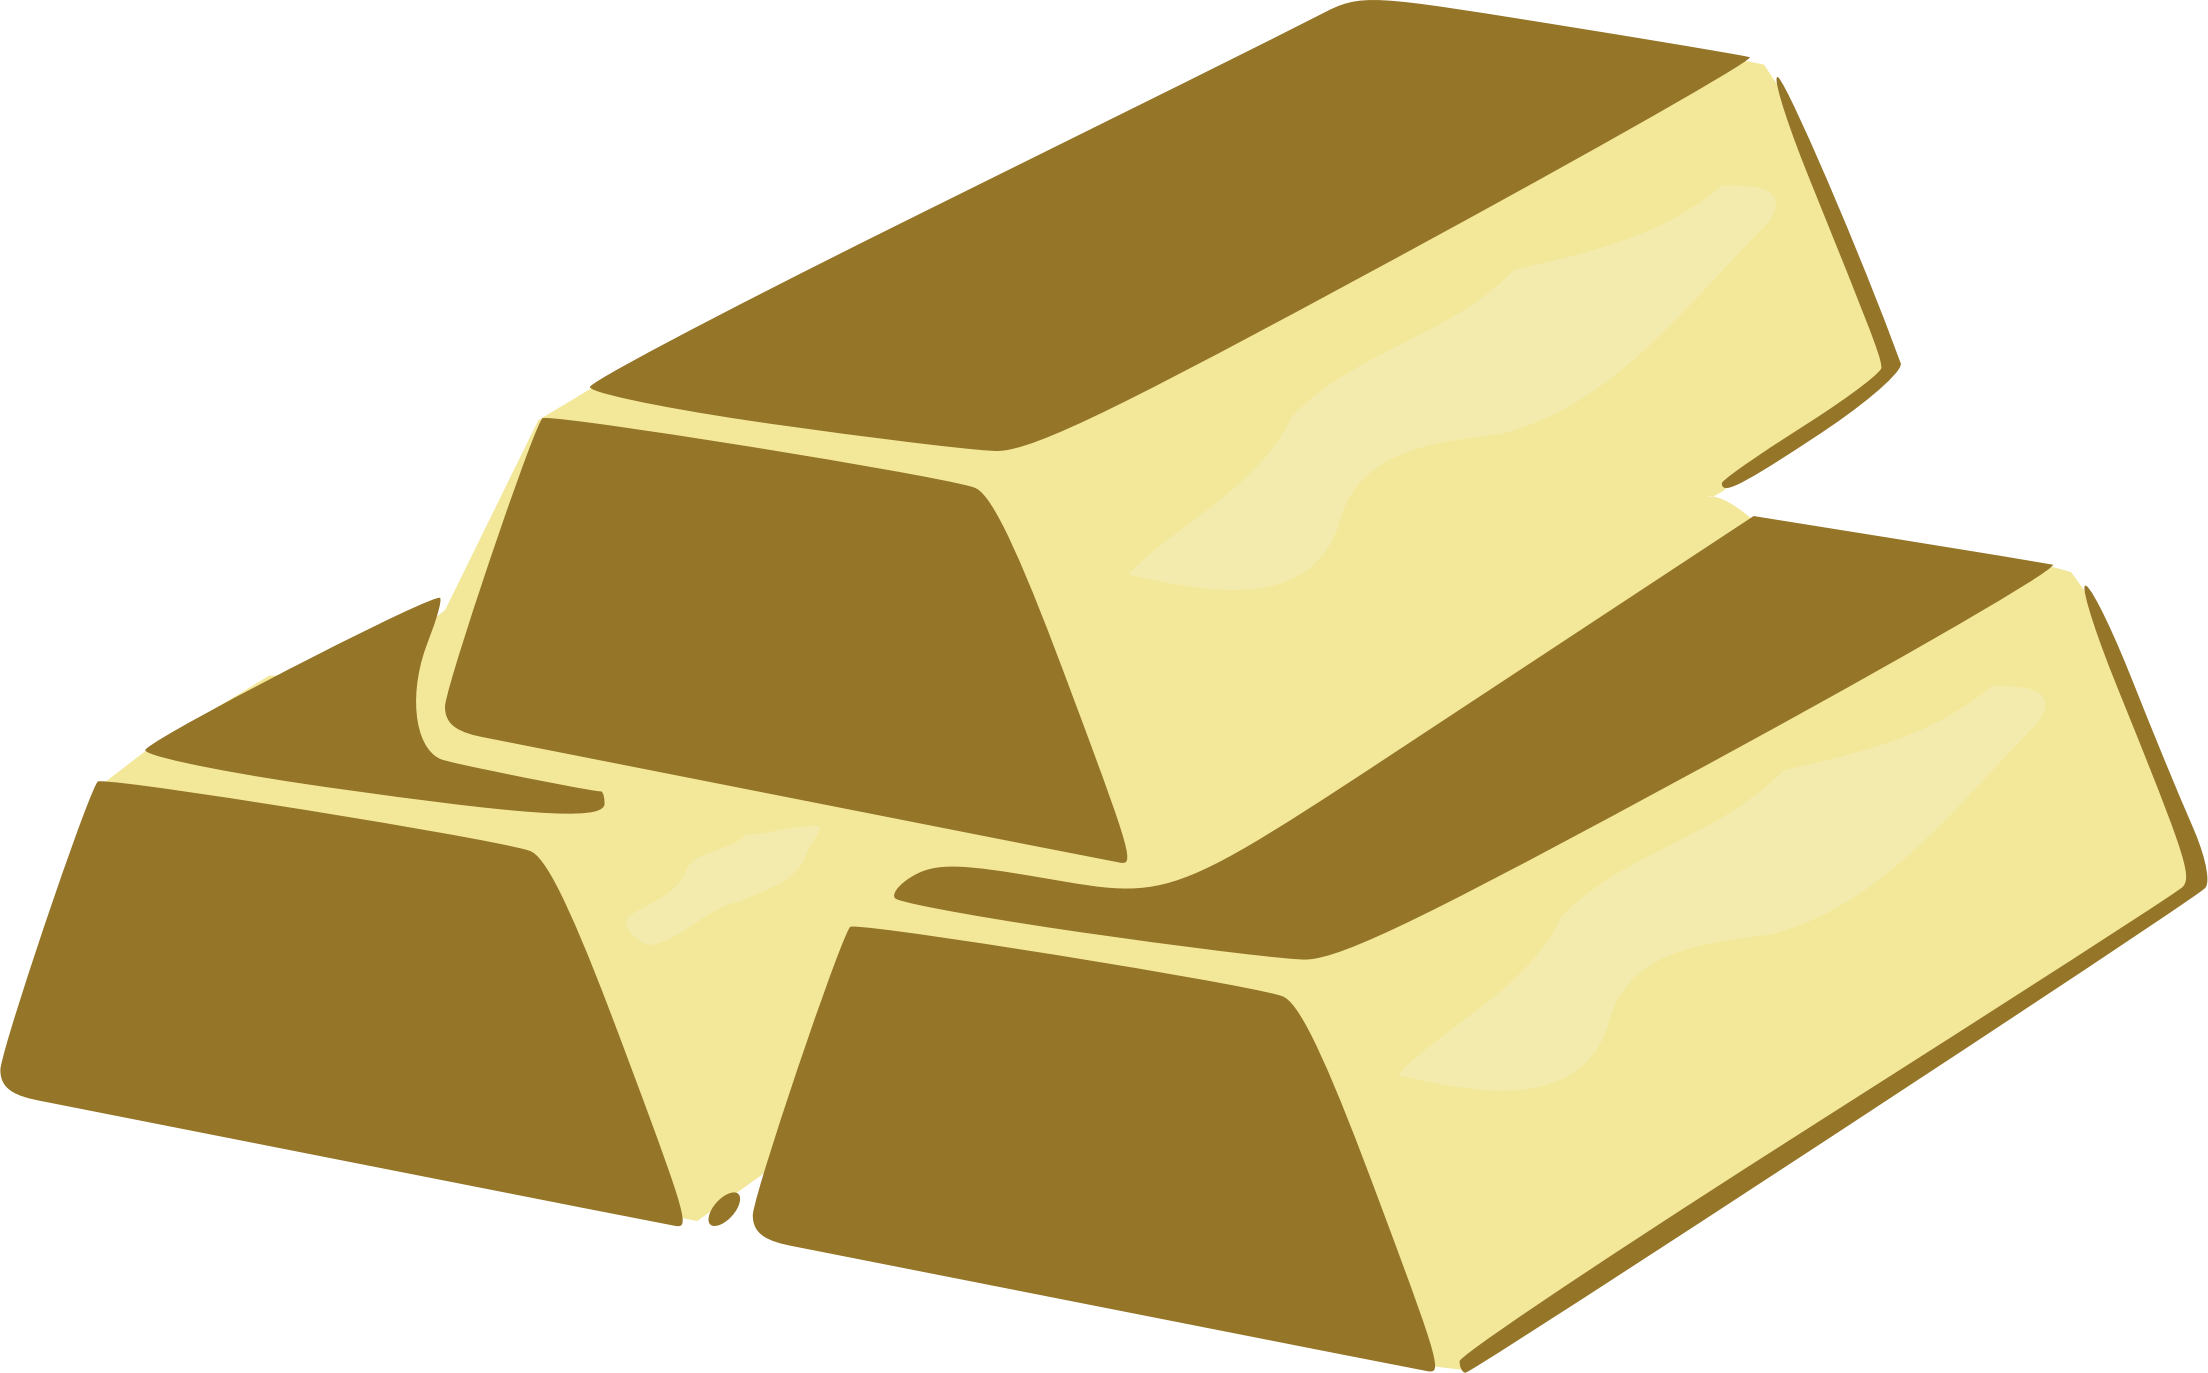 Gold clipart. Bricks big image png